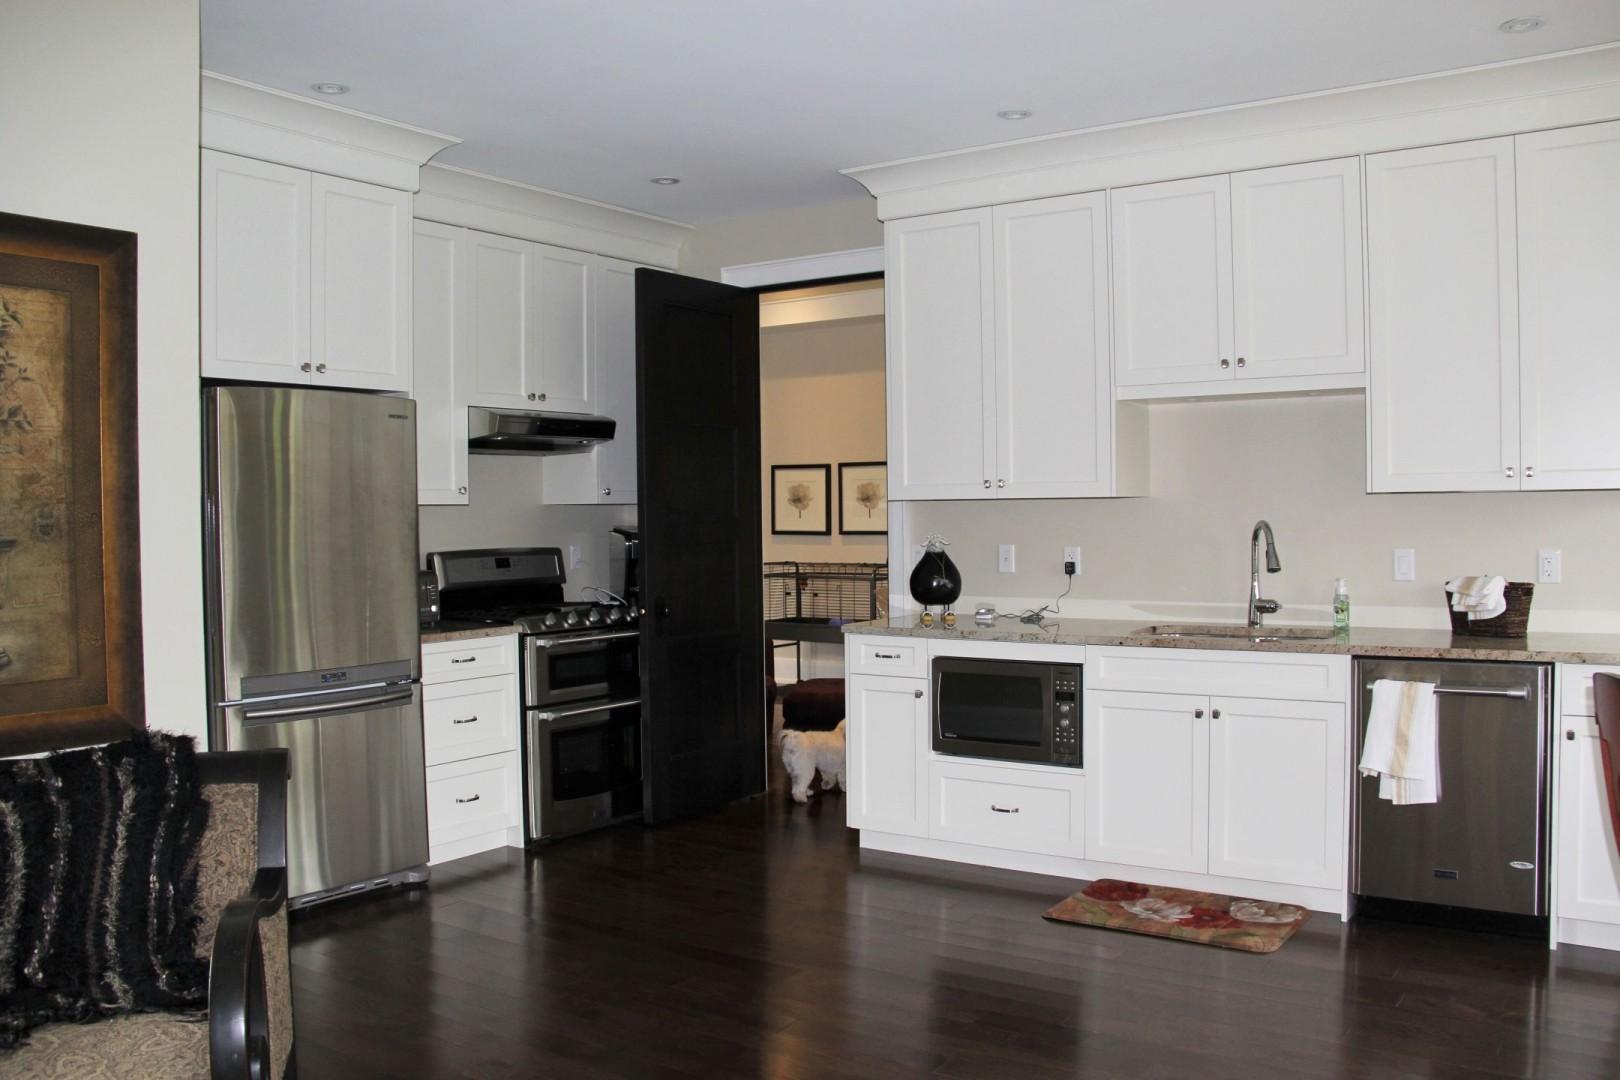 Laura Nicholson - apartment kitchen3